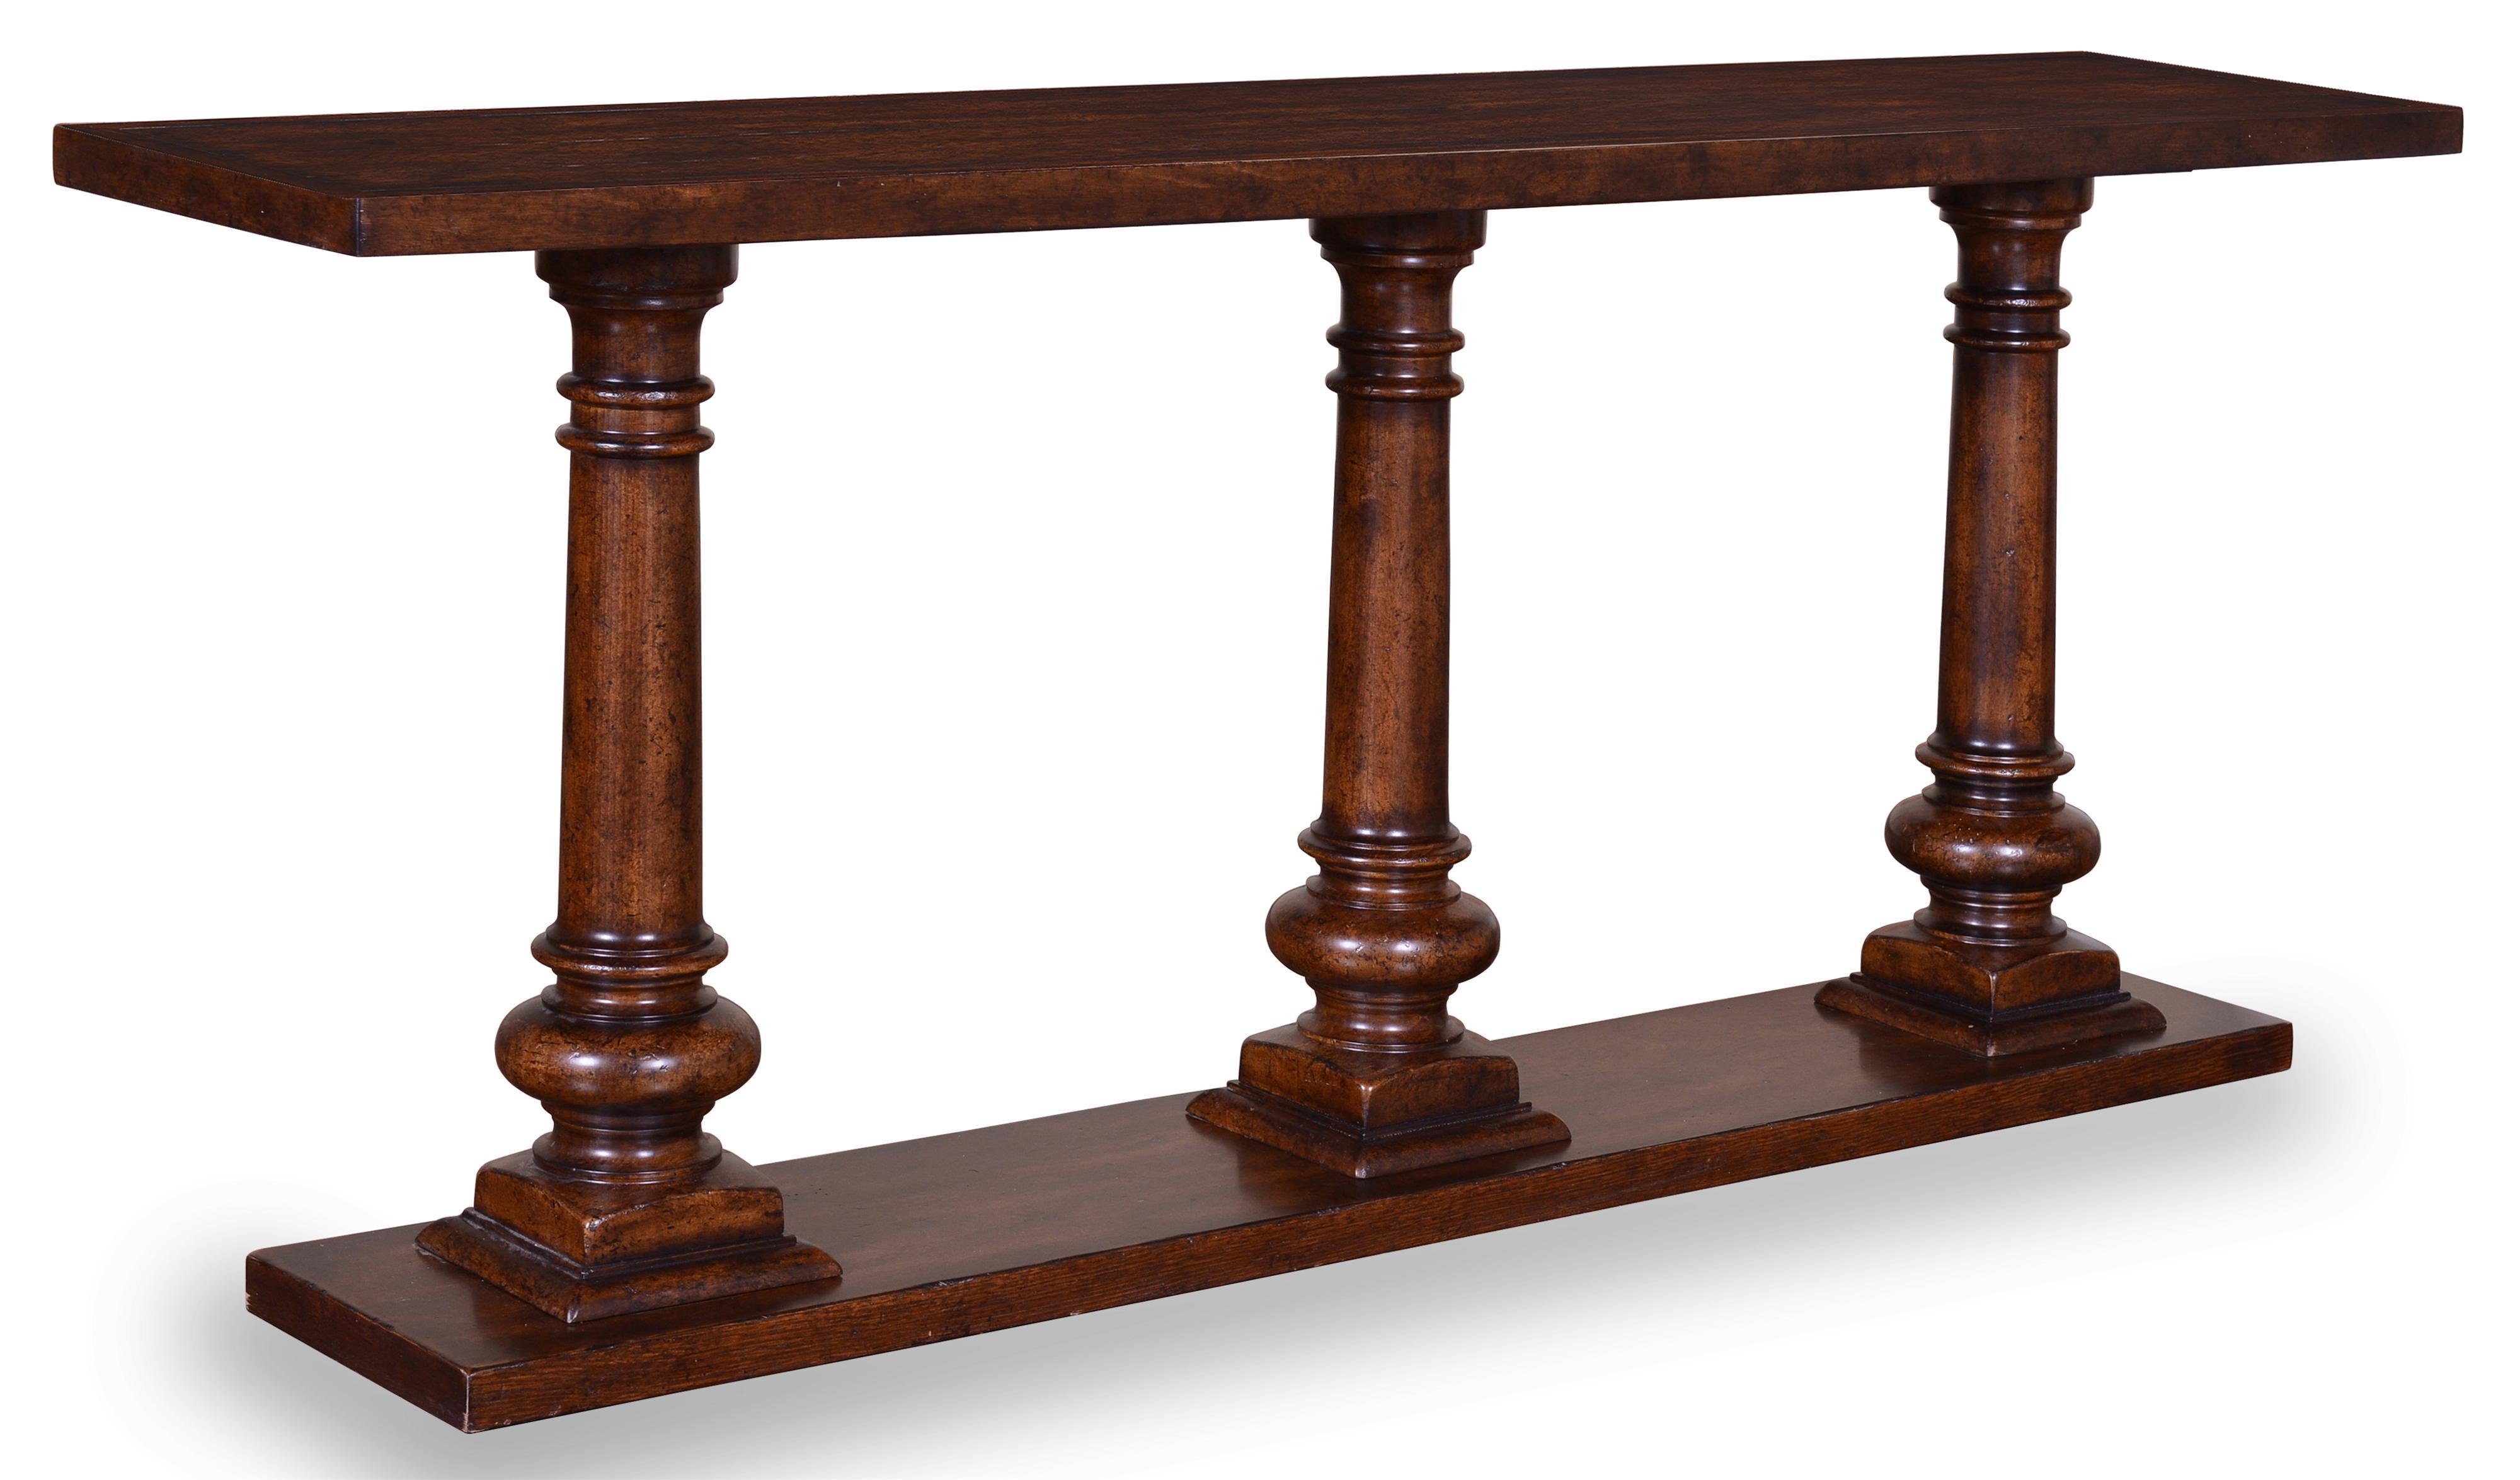 Belfort Signature Belvedere Sofa Table - Item Number: 205307-2304